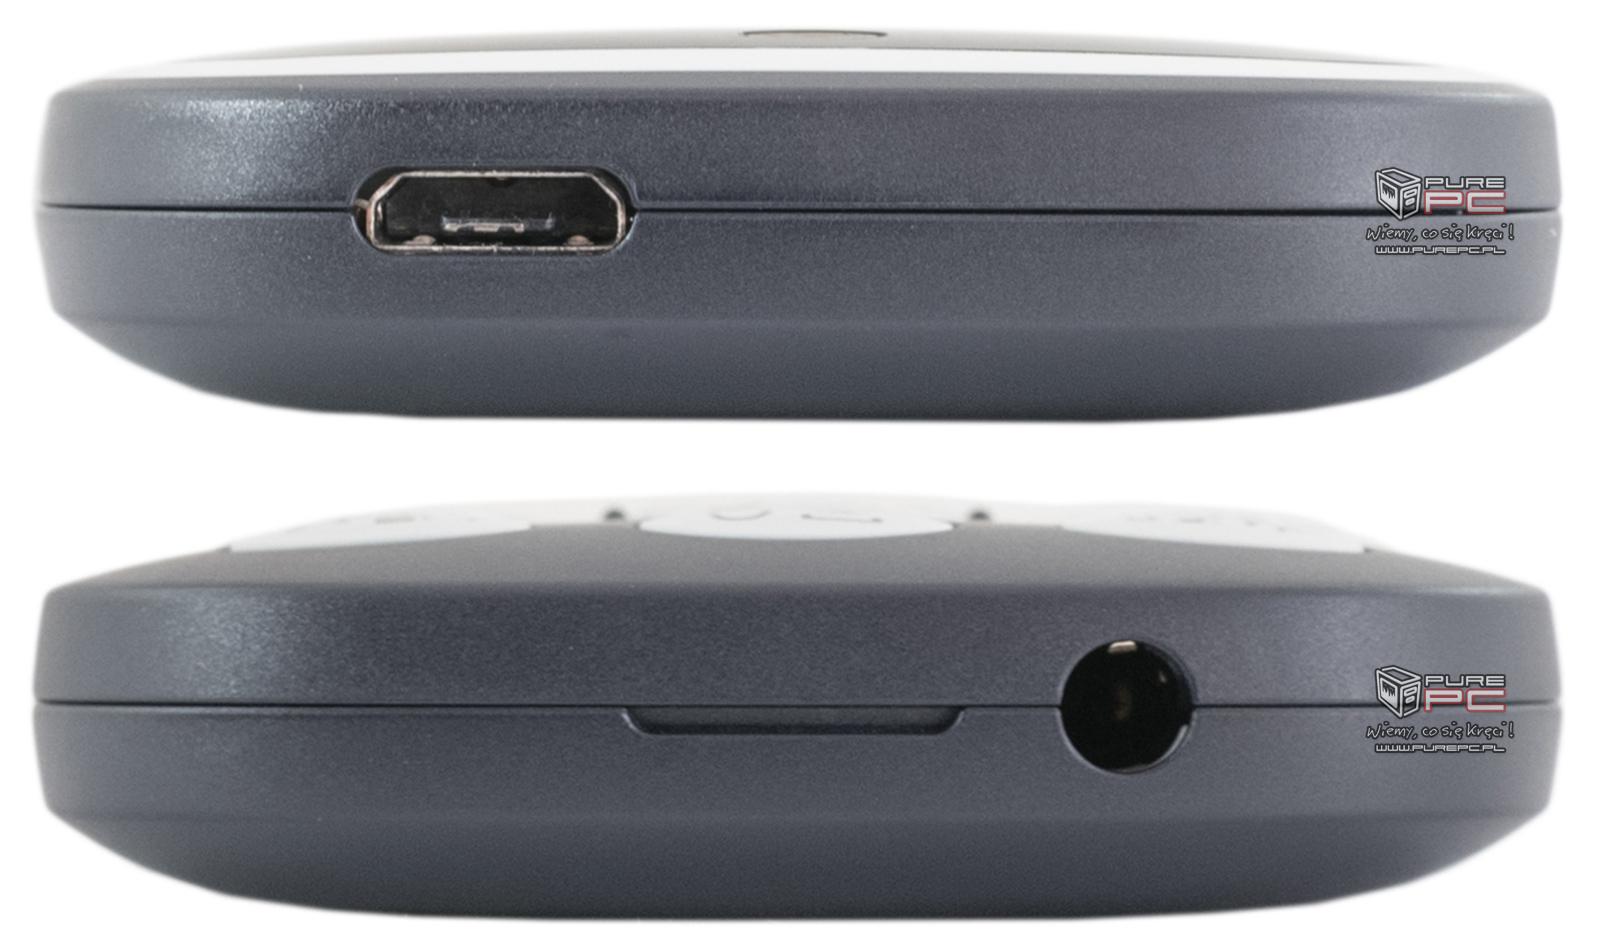 Mini Recenzja Telefonu Nokia 3310 2017 I Na Co To Komu Troubleshooting